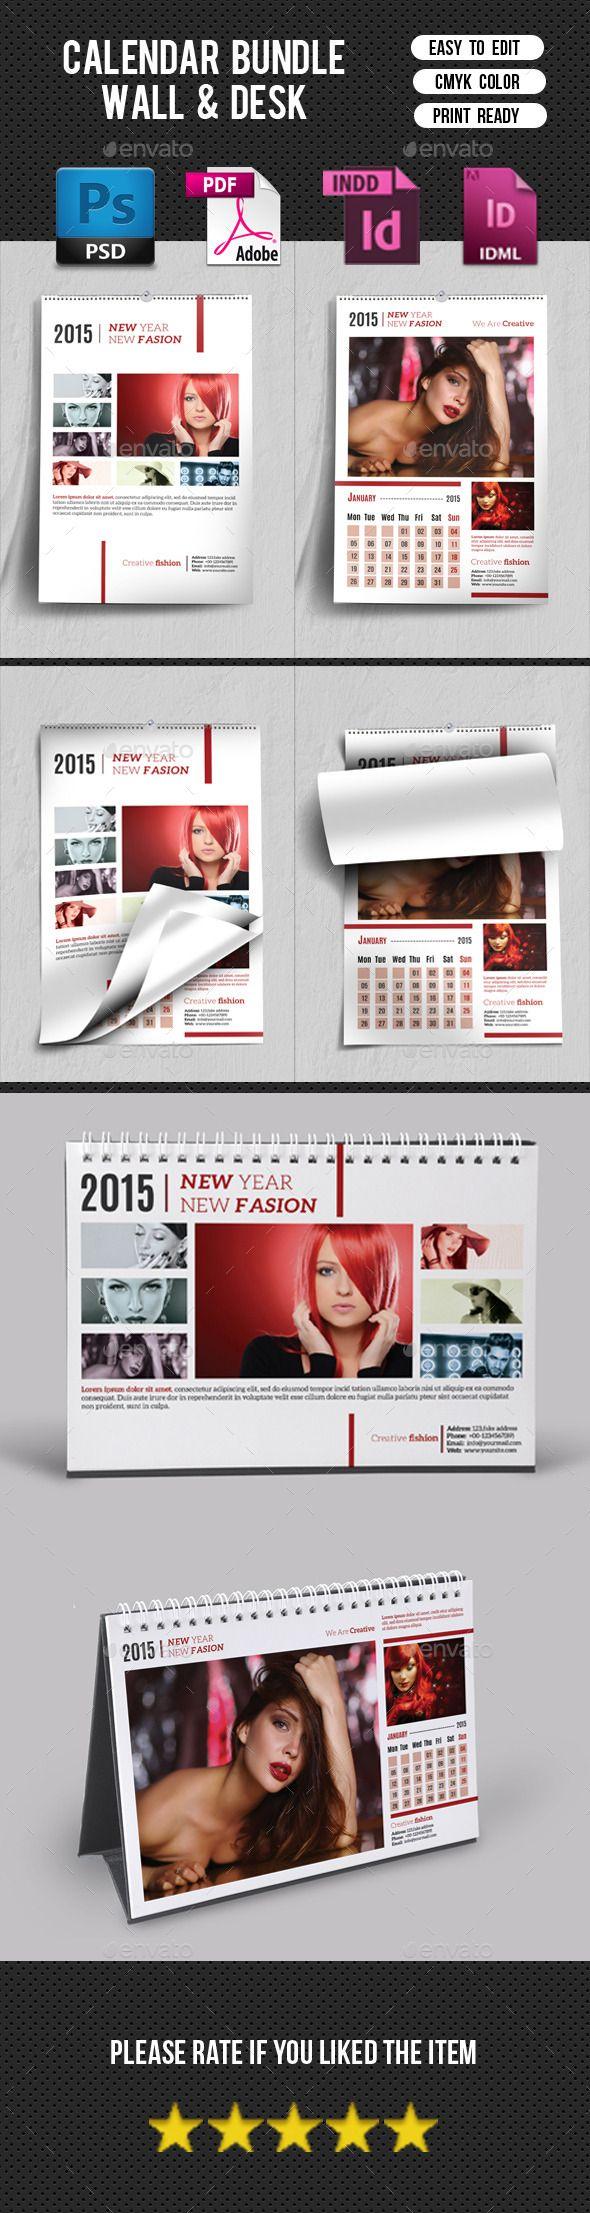 Wall & Desk Calendar Bundle Template | Download: http://graphicriver.net/item/wall-desk-calendar-bundlev01/9918990?ref=ksioks